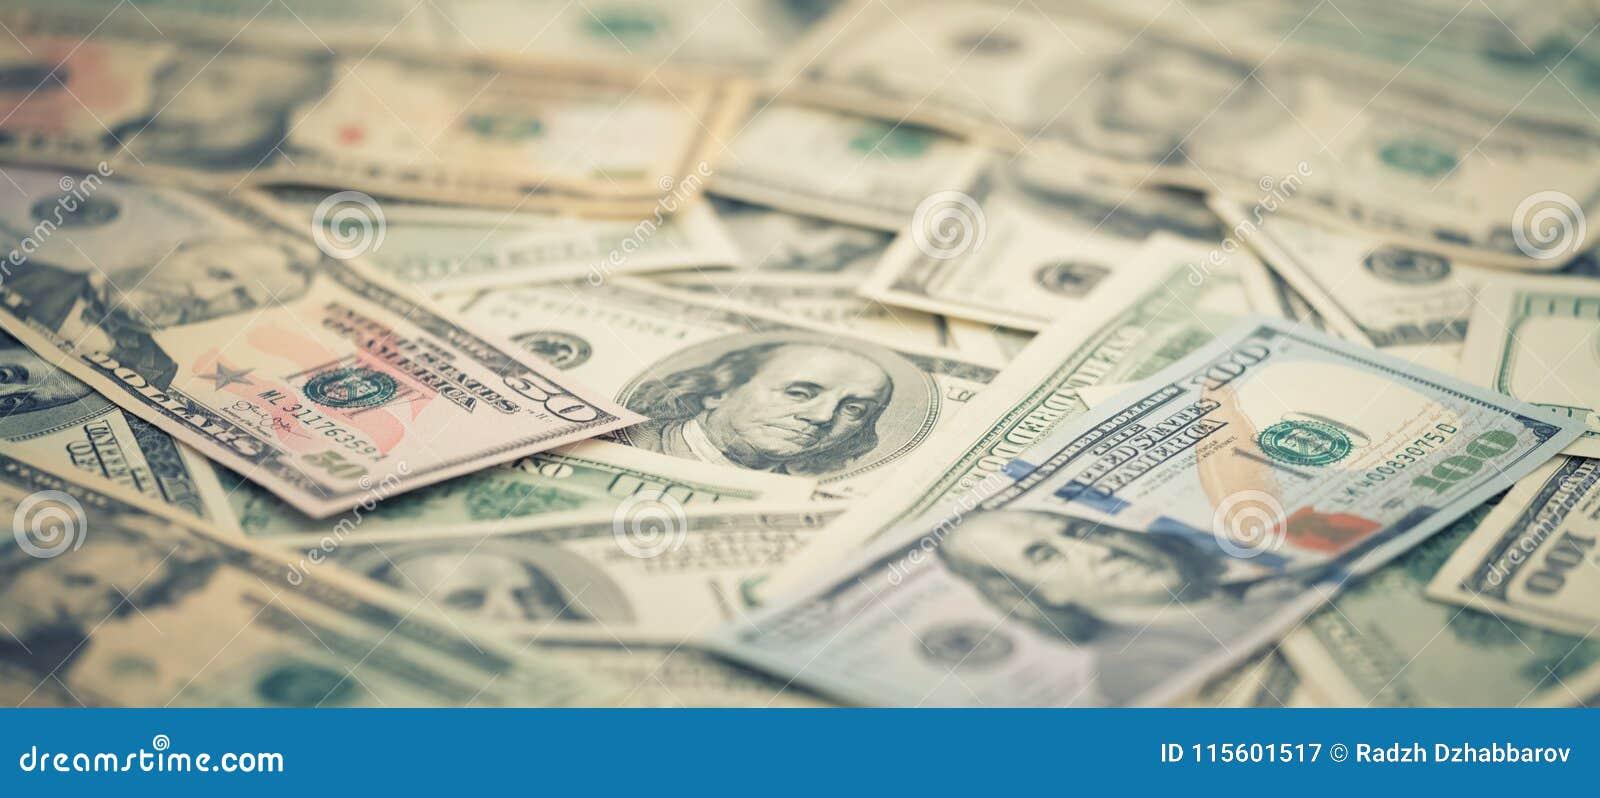 Wallpaper Closeup Series American Money 5,10, 20, 50, New